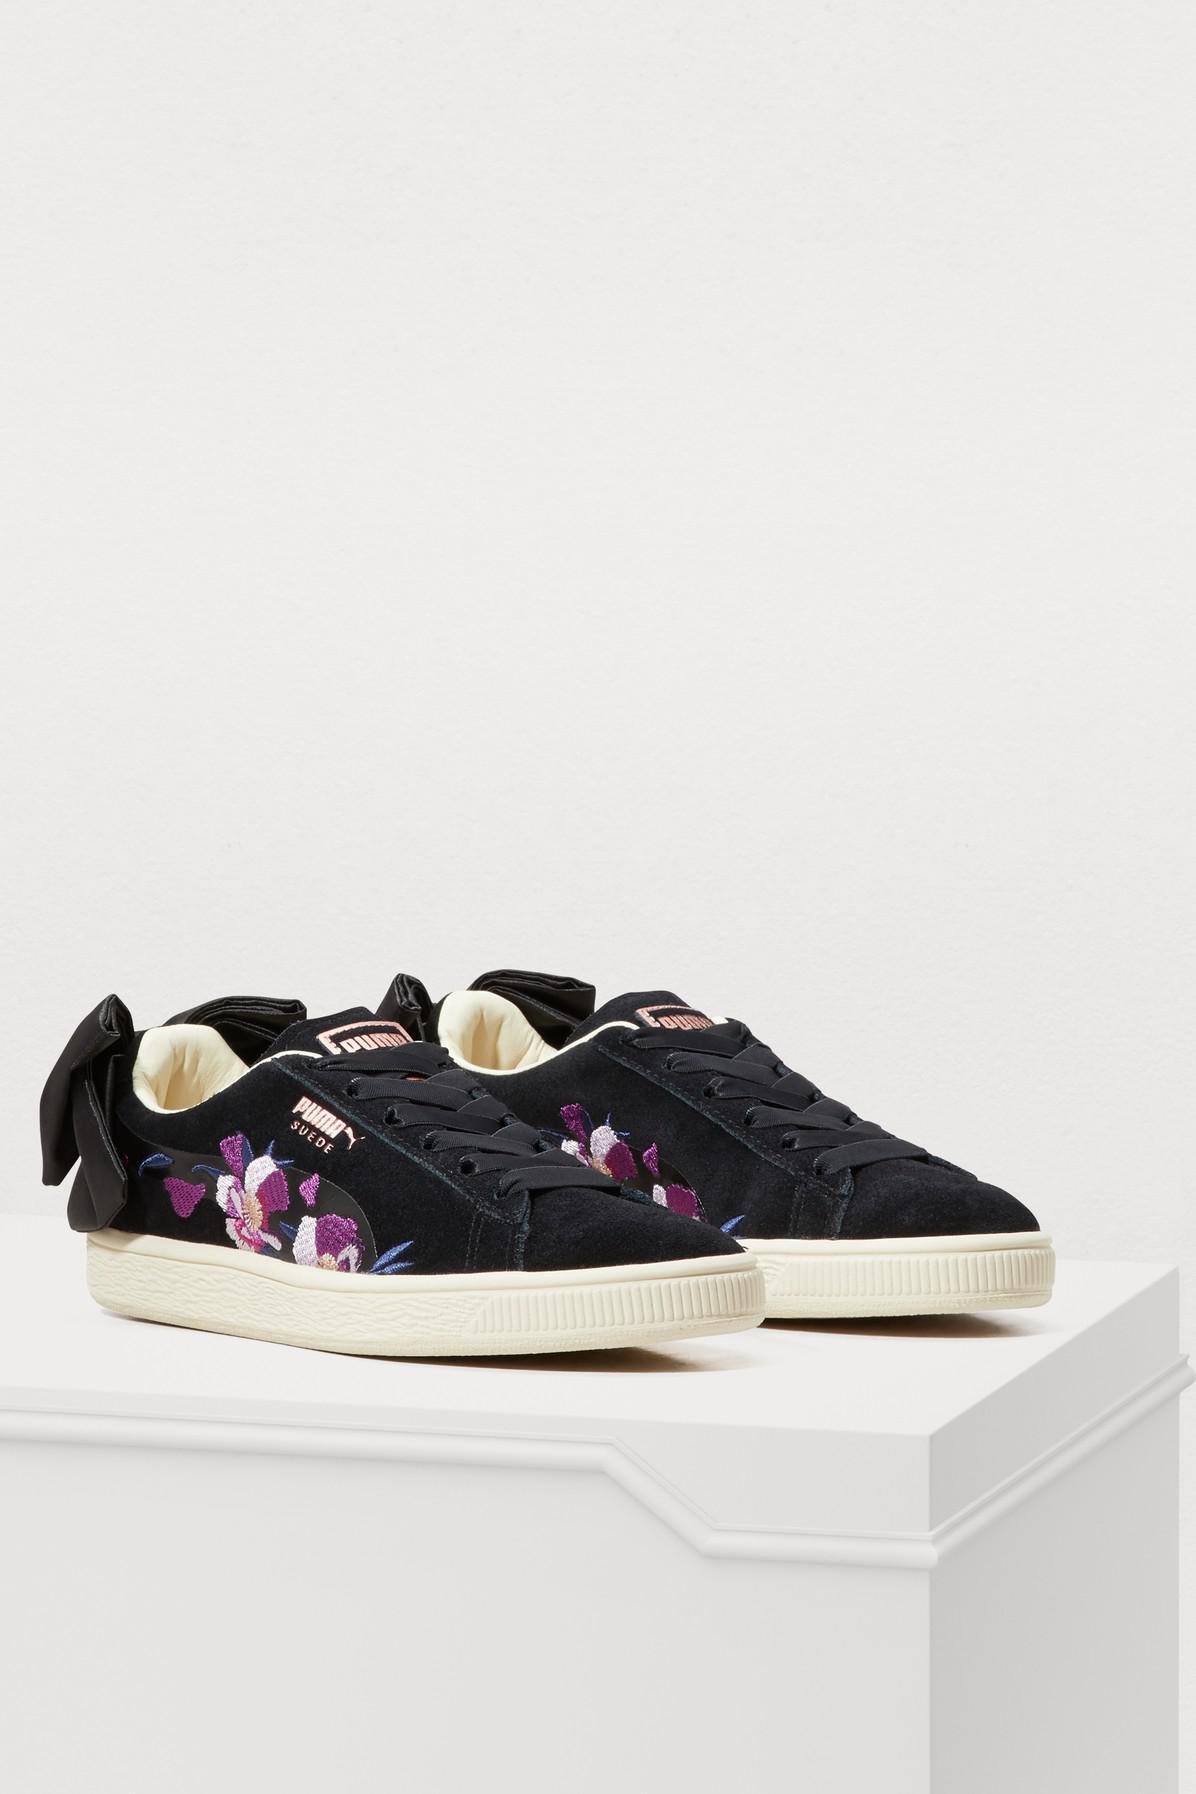 PUMA - Black Bow Flowery Sneakers - Lyst. View fullscreen 4718fe95e